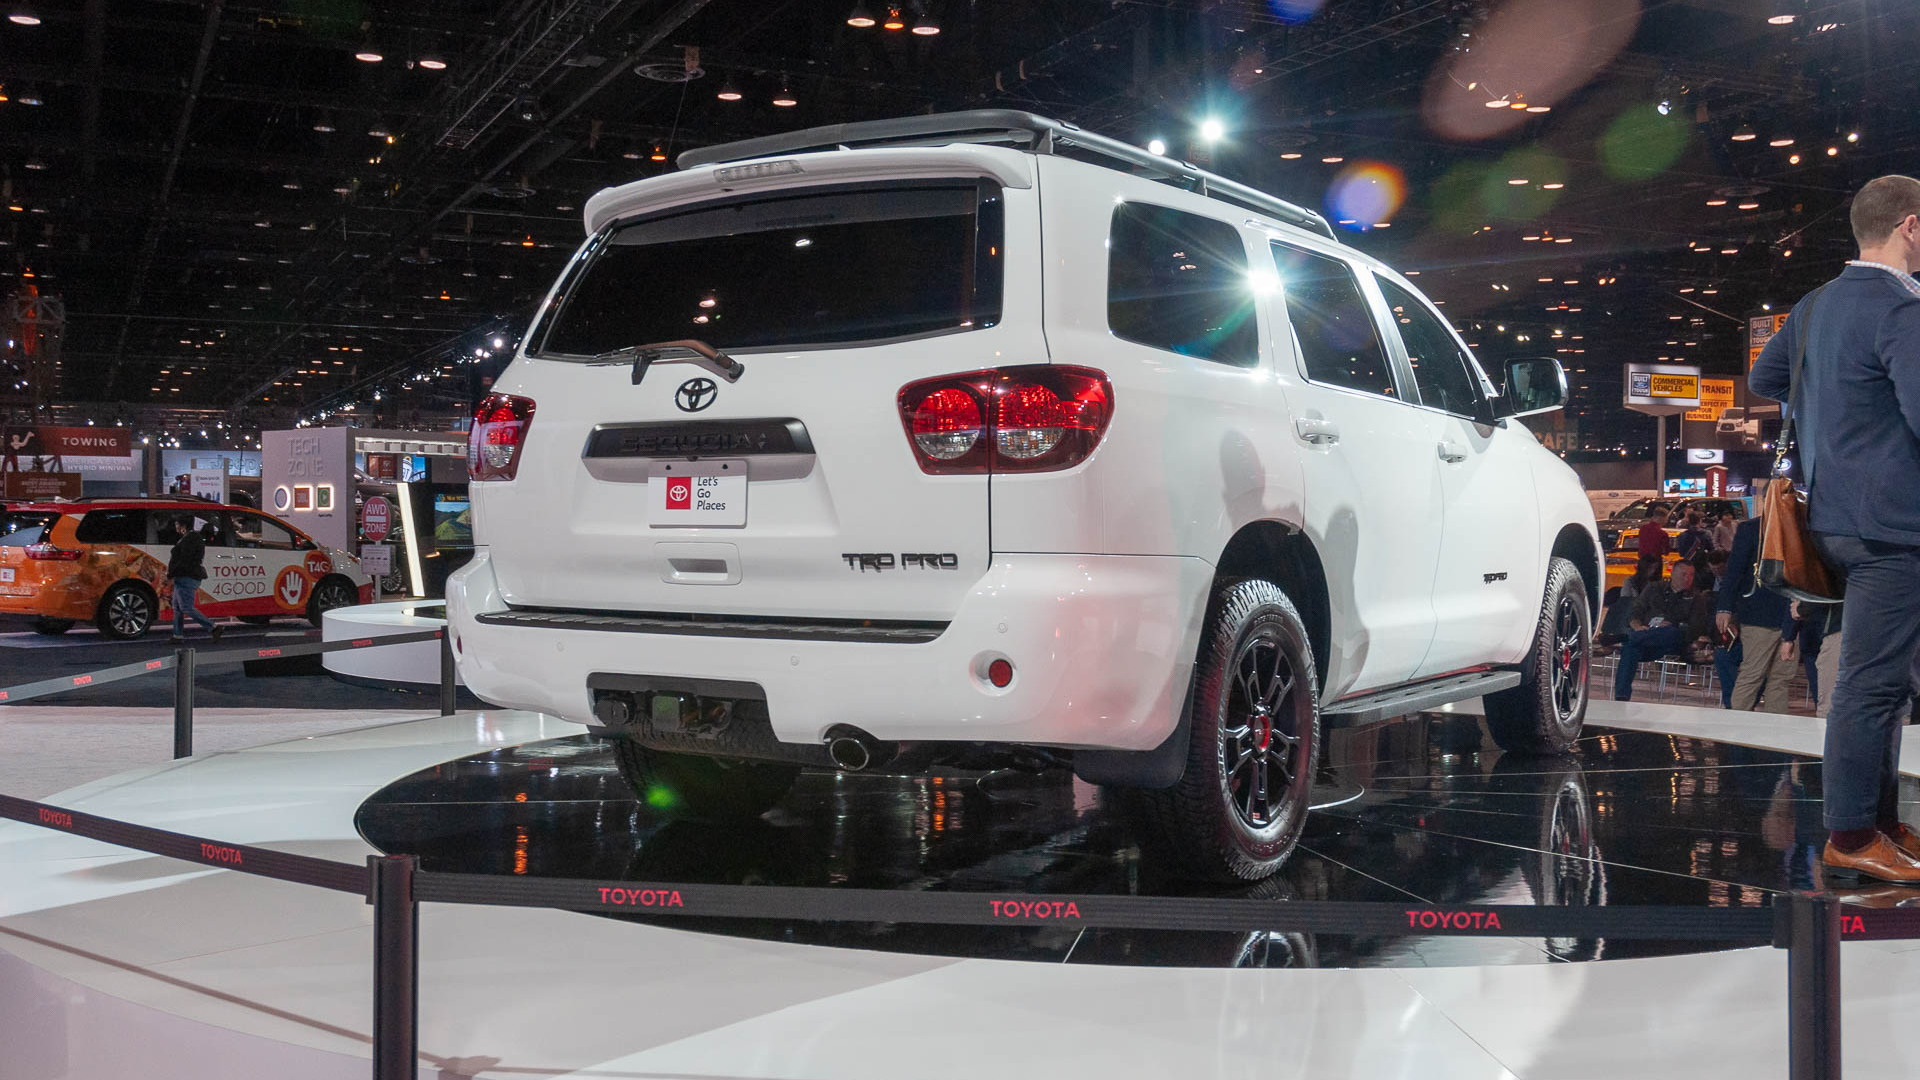 2020 Toyota Sequoia, 2019 Chicago Auto Show